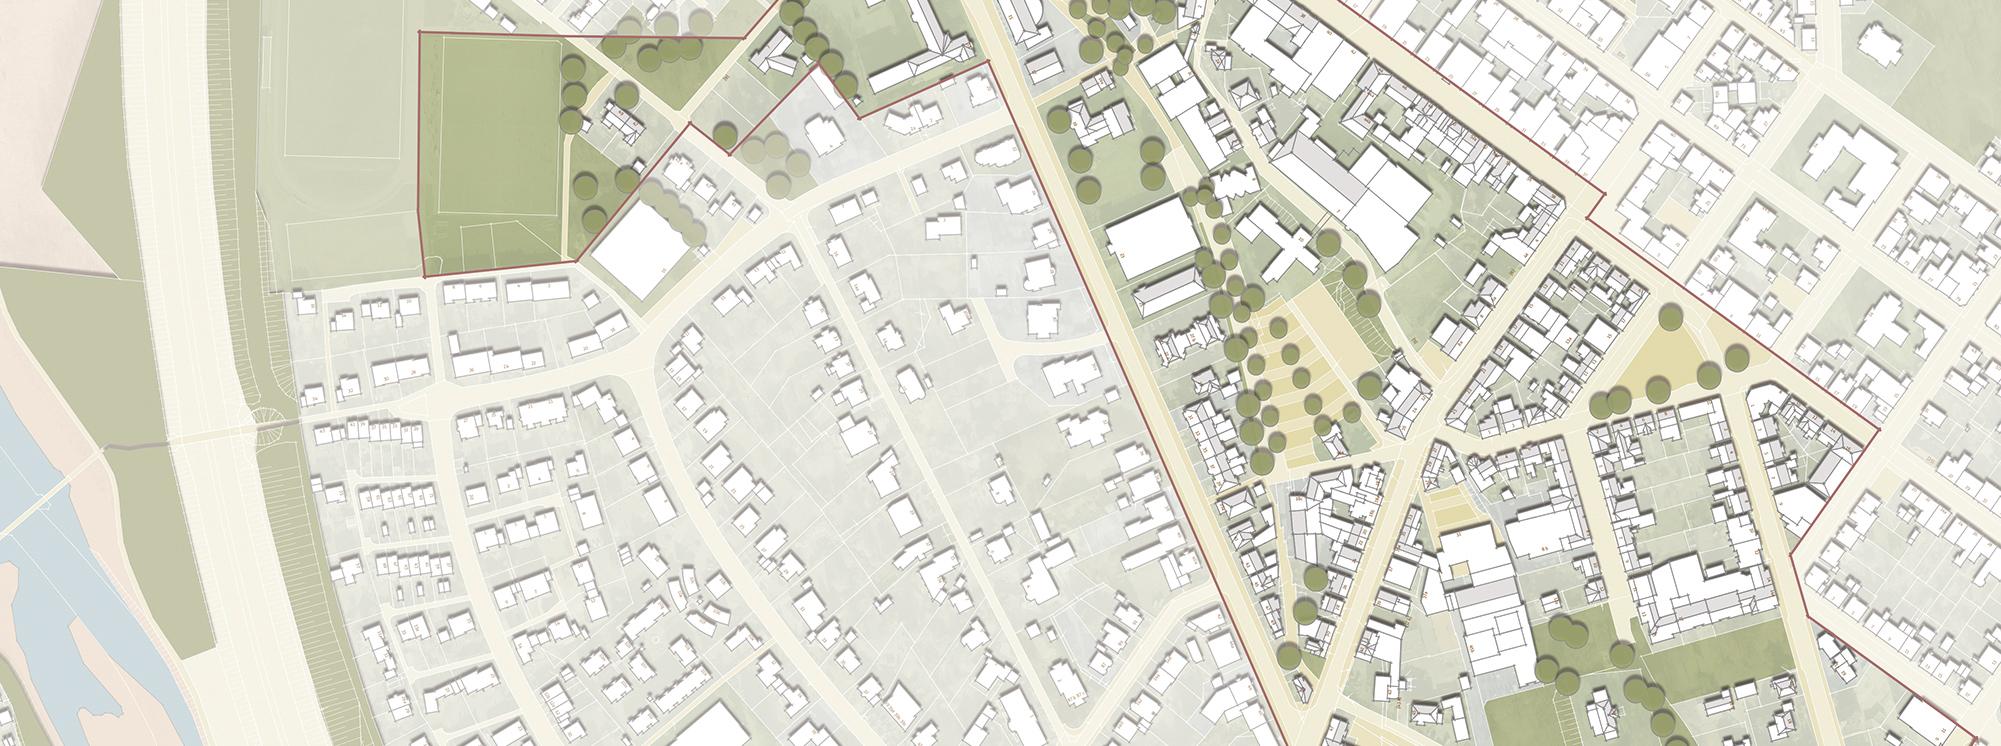 Pesch Partner, Städtebau, Rahmenplan, Arnsberg, Stadtraum